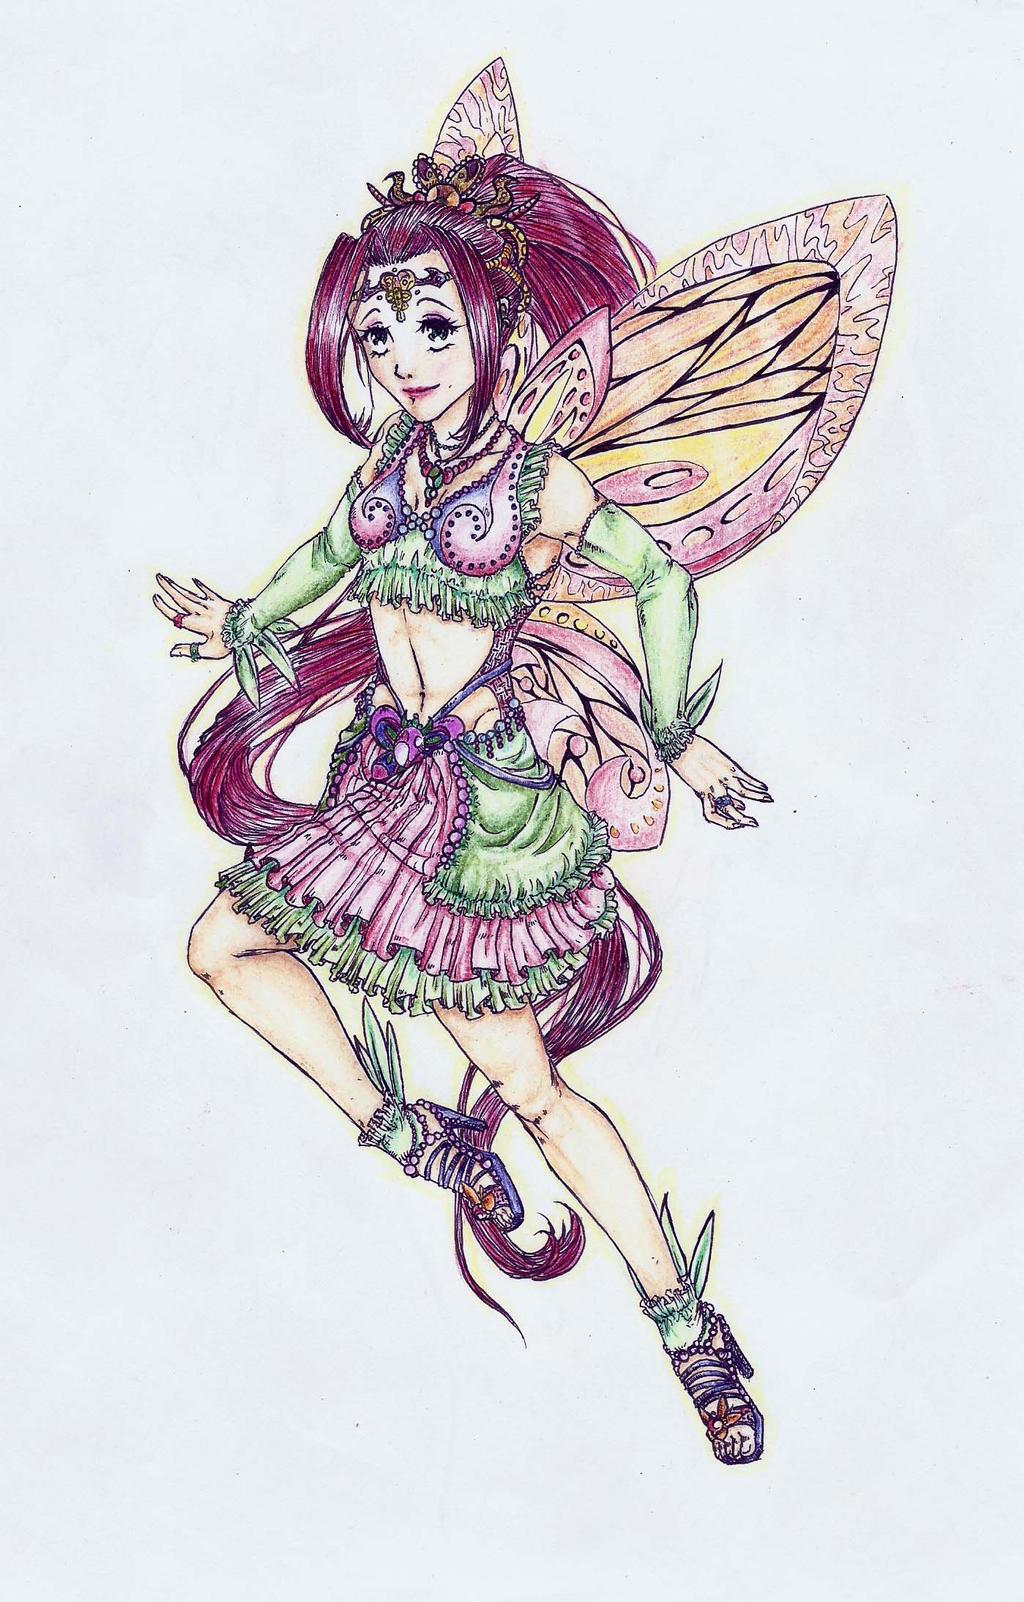 Magical girl by MidoriBara